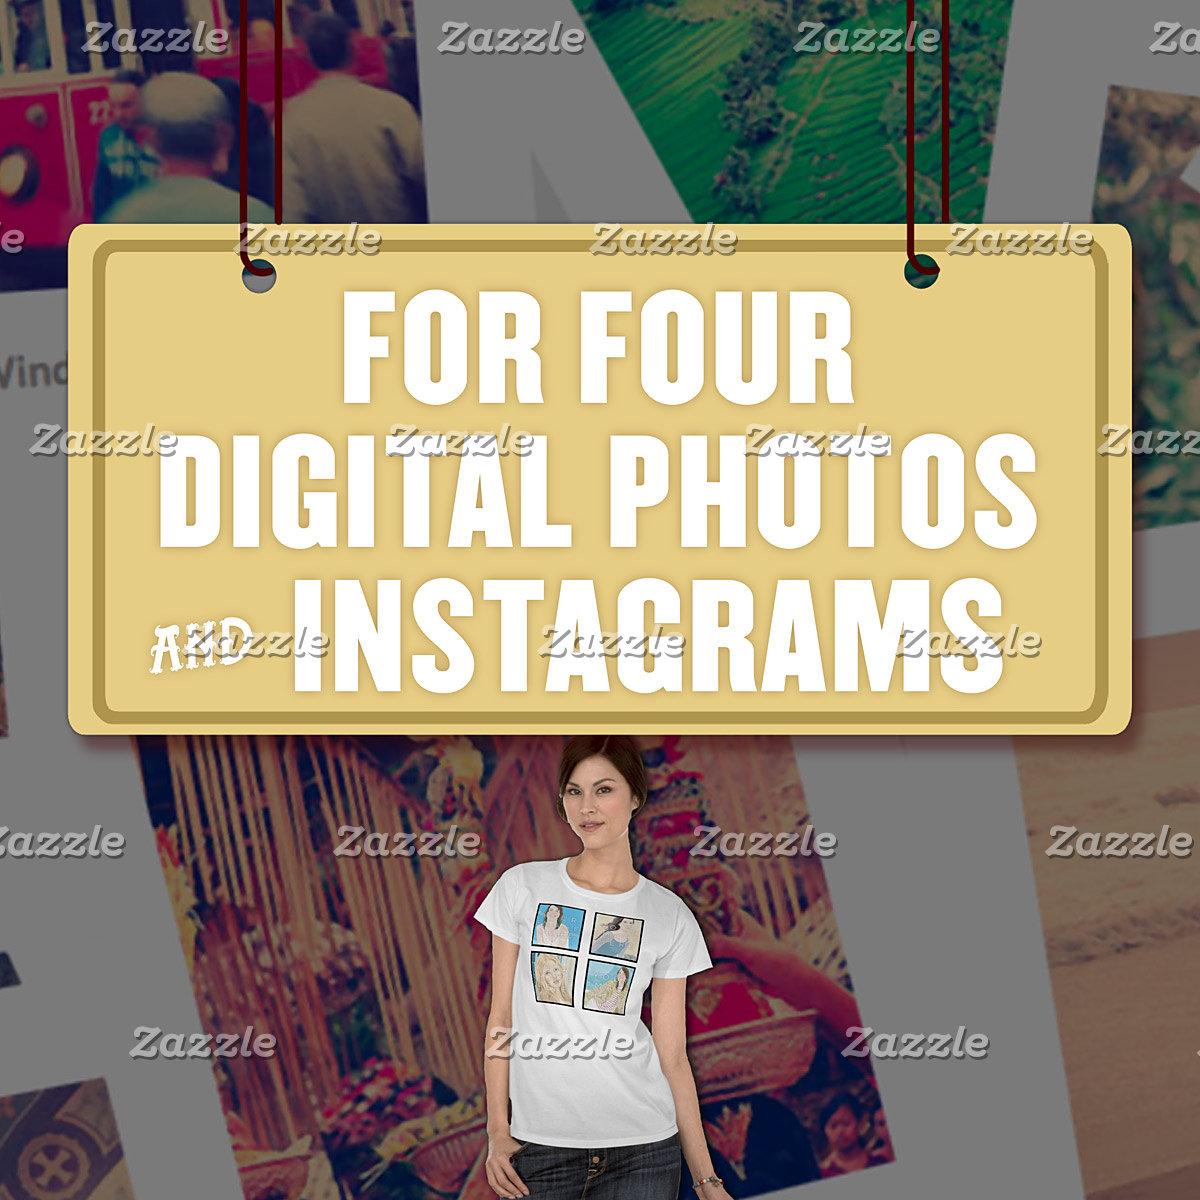 For Four (4) Digital Photos & Instagrams